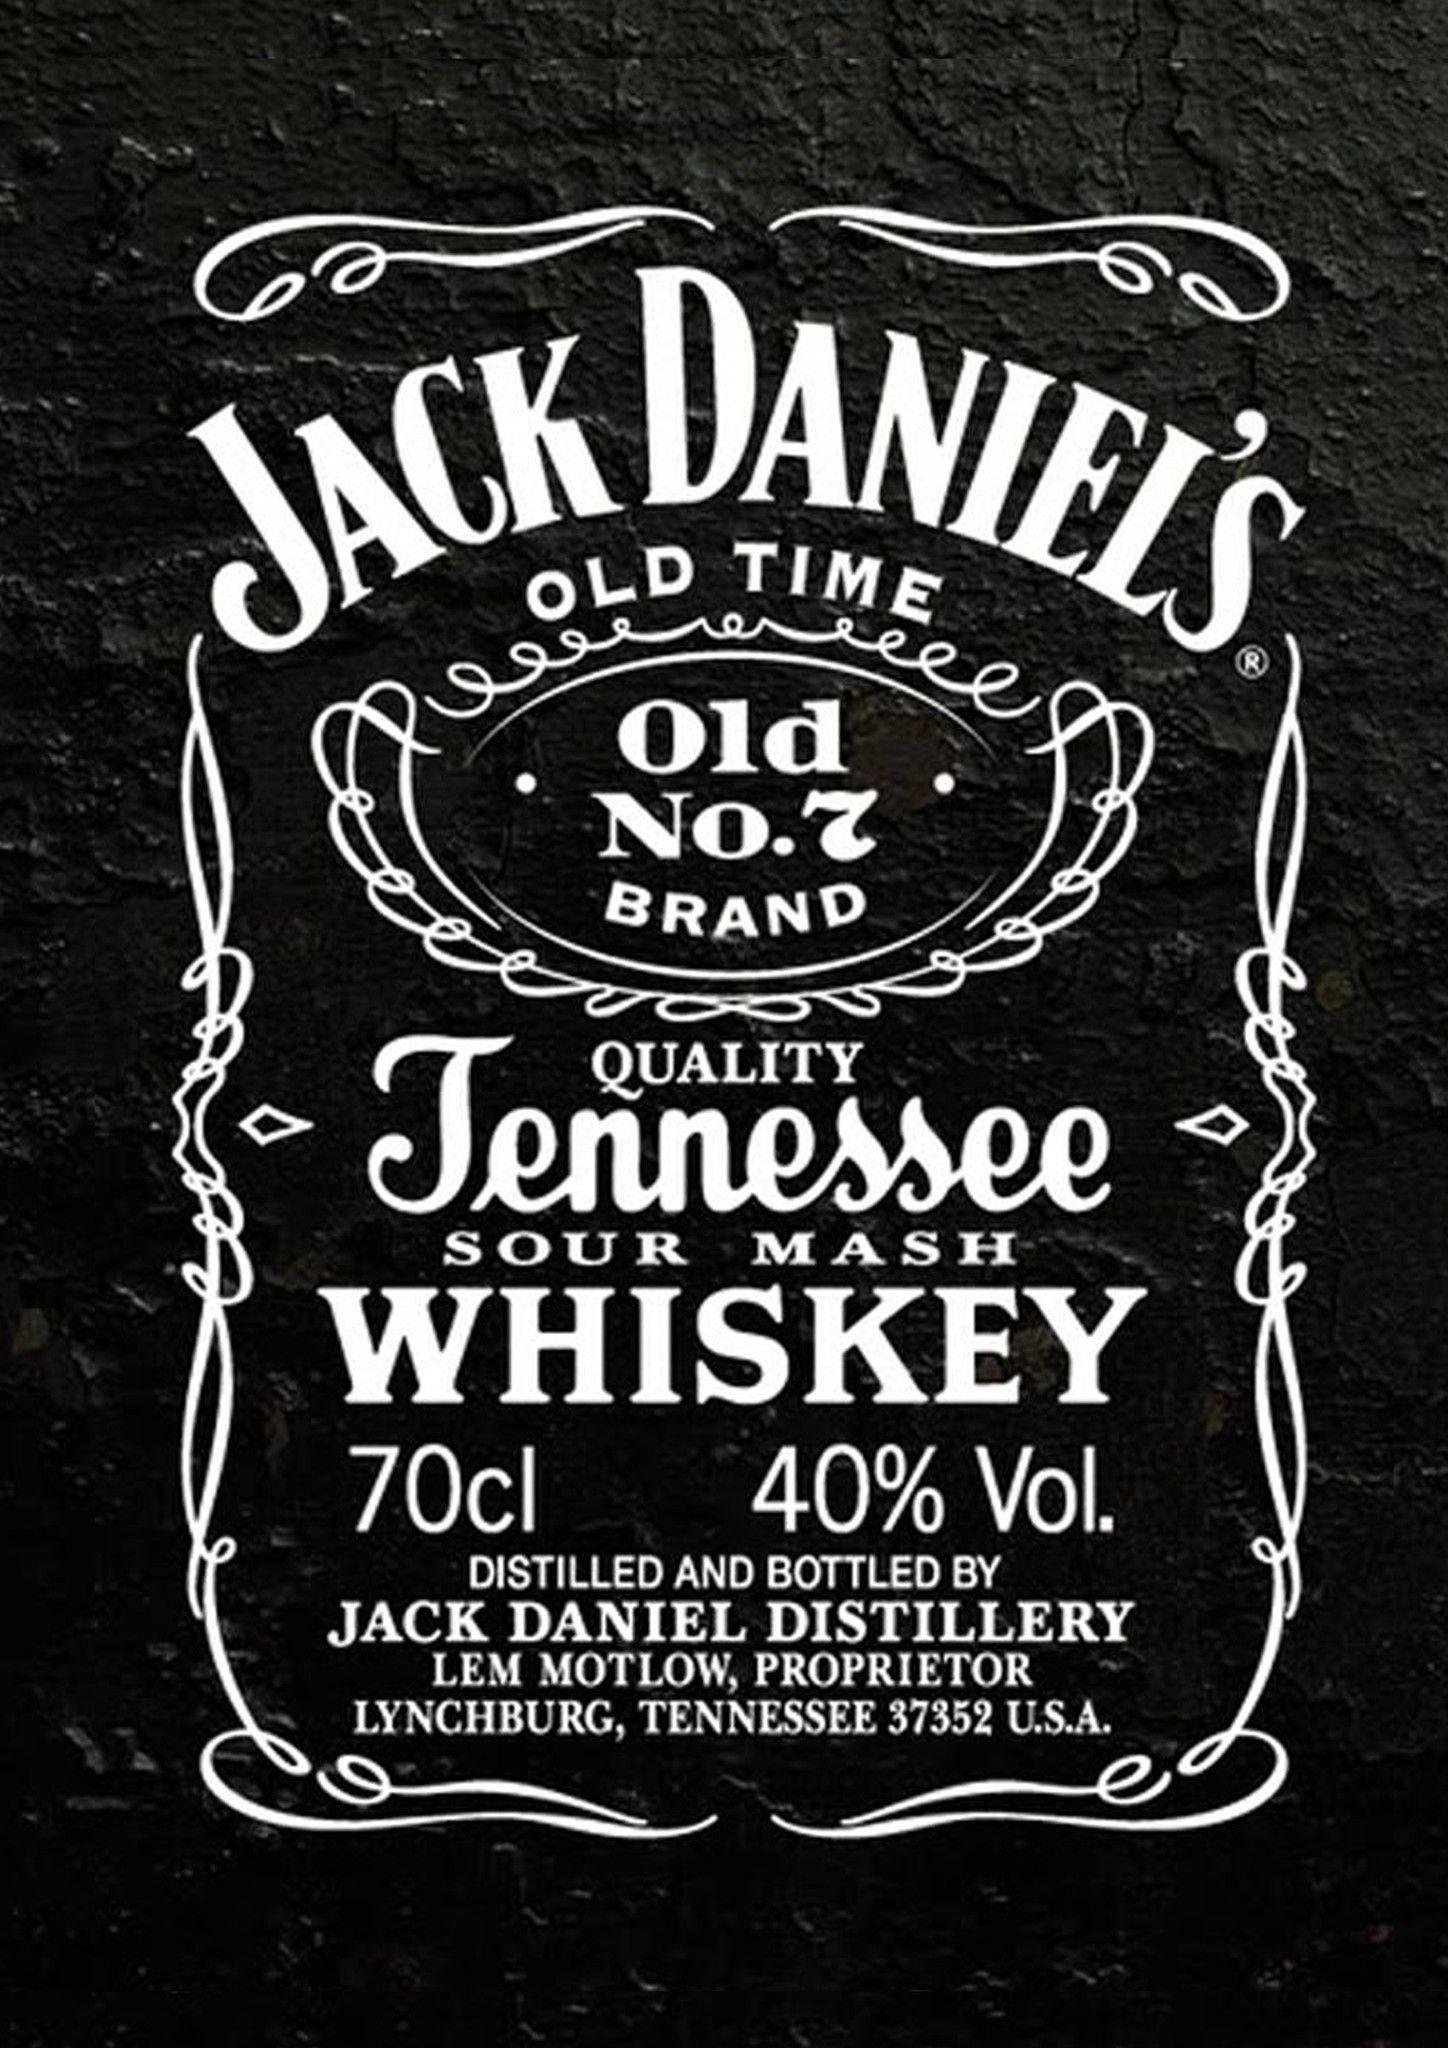 Jack Daniel's Poster Jack daniels, Jack daniel's